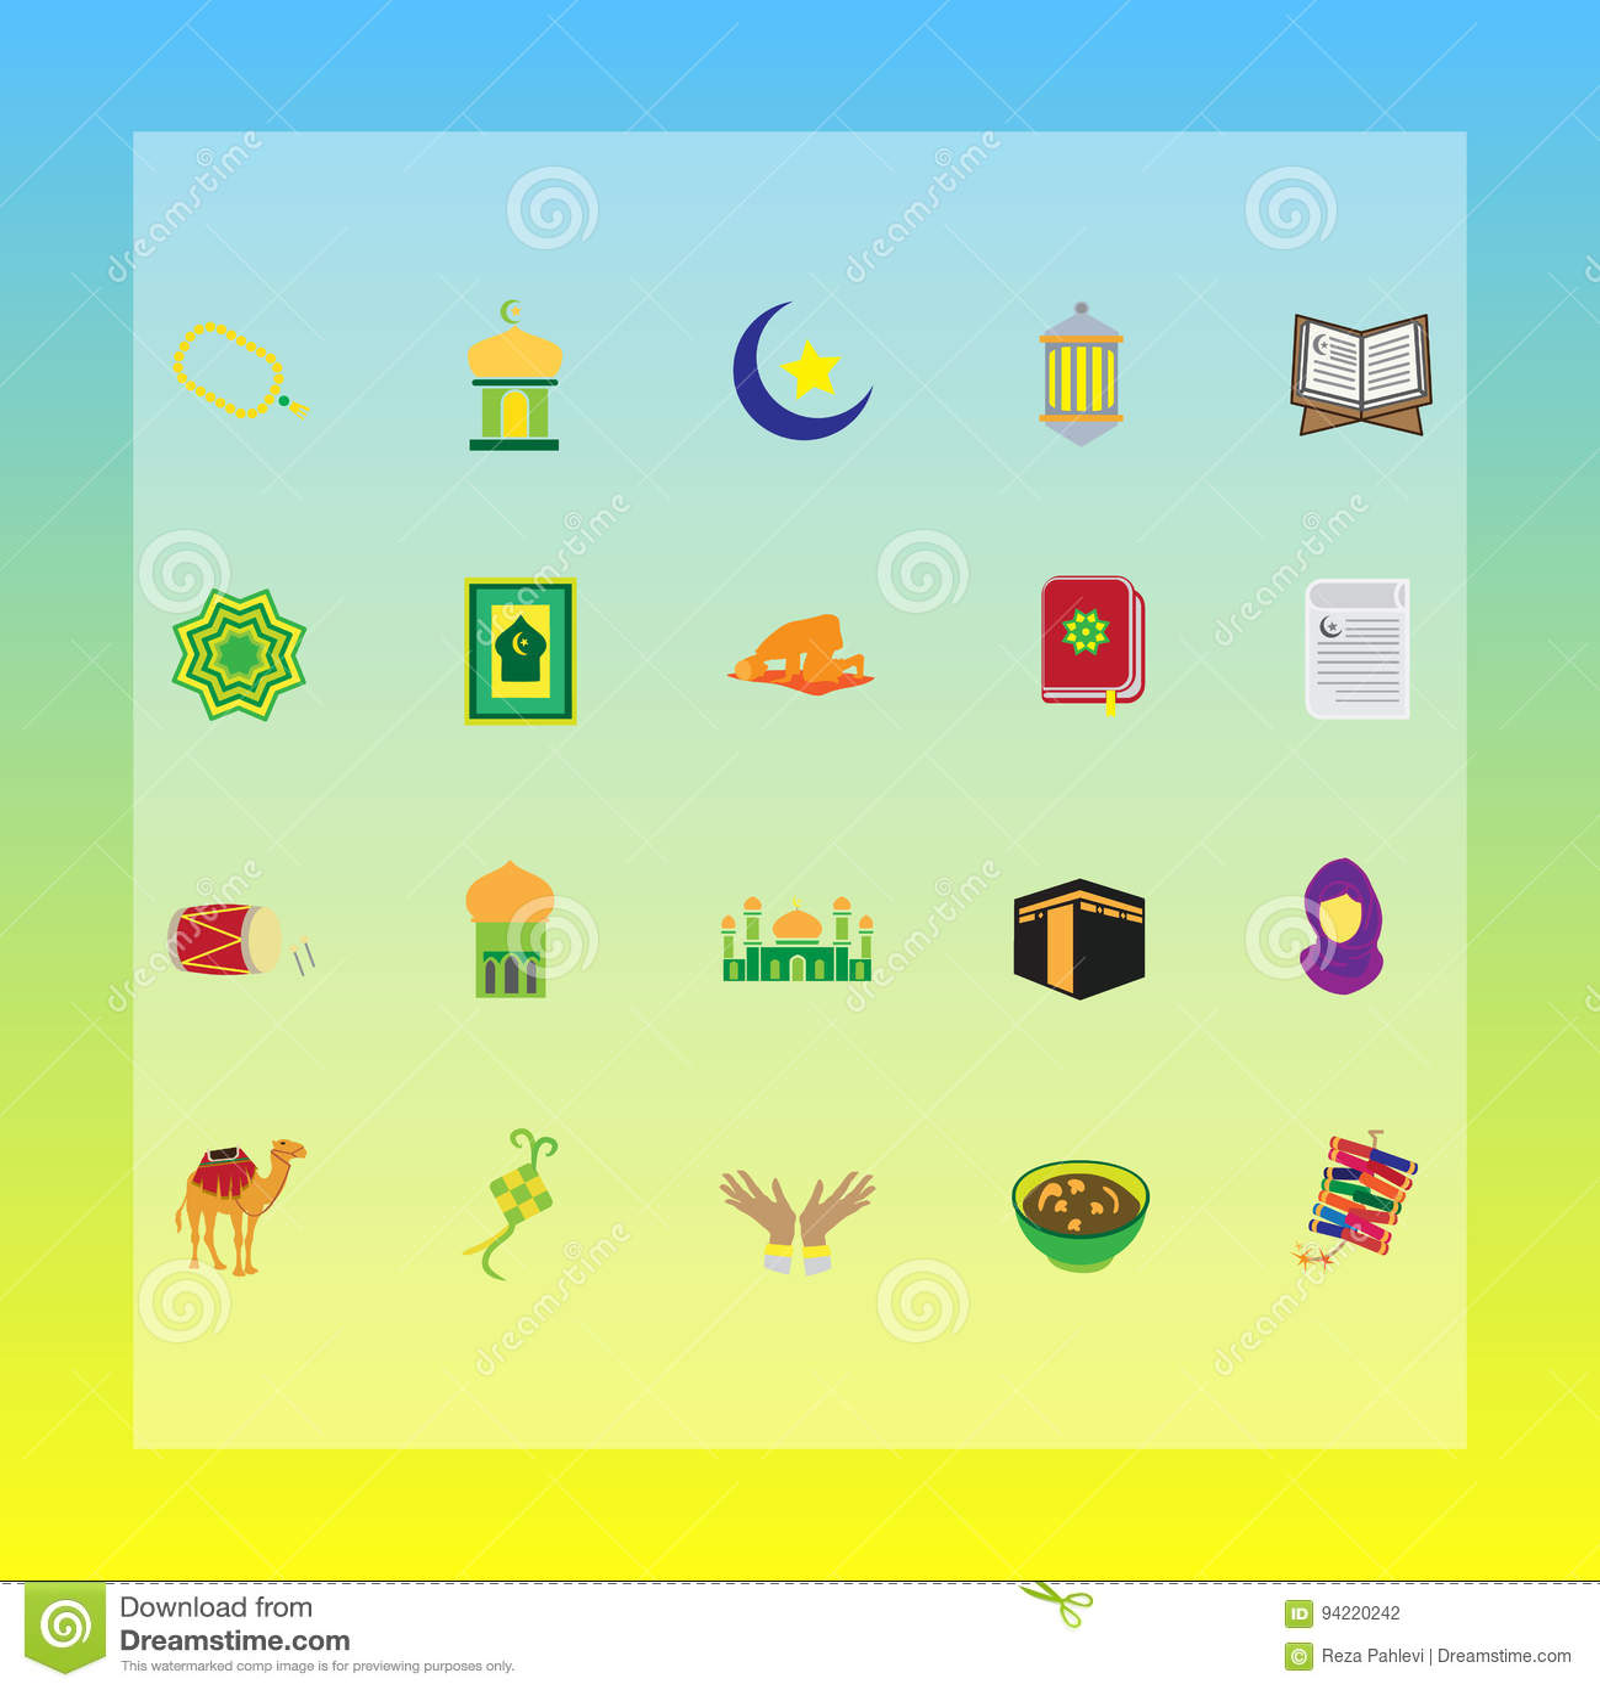 Islamic muslim concept flat icons for ramadhan hajj eid mubarak download islamic muslim concept flat icons for ramadhan hajj eid mubarak eid al m4hsunfo